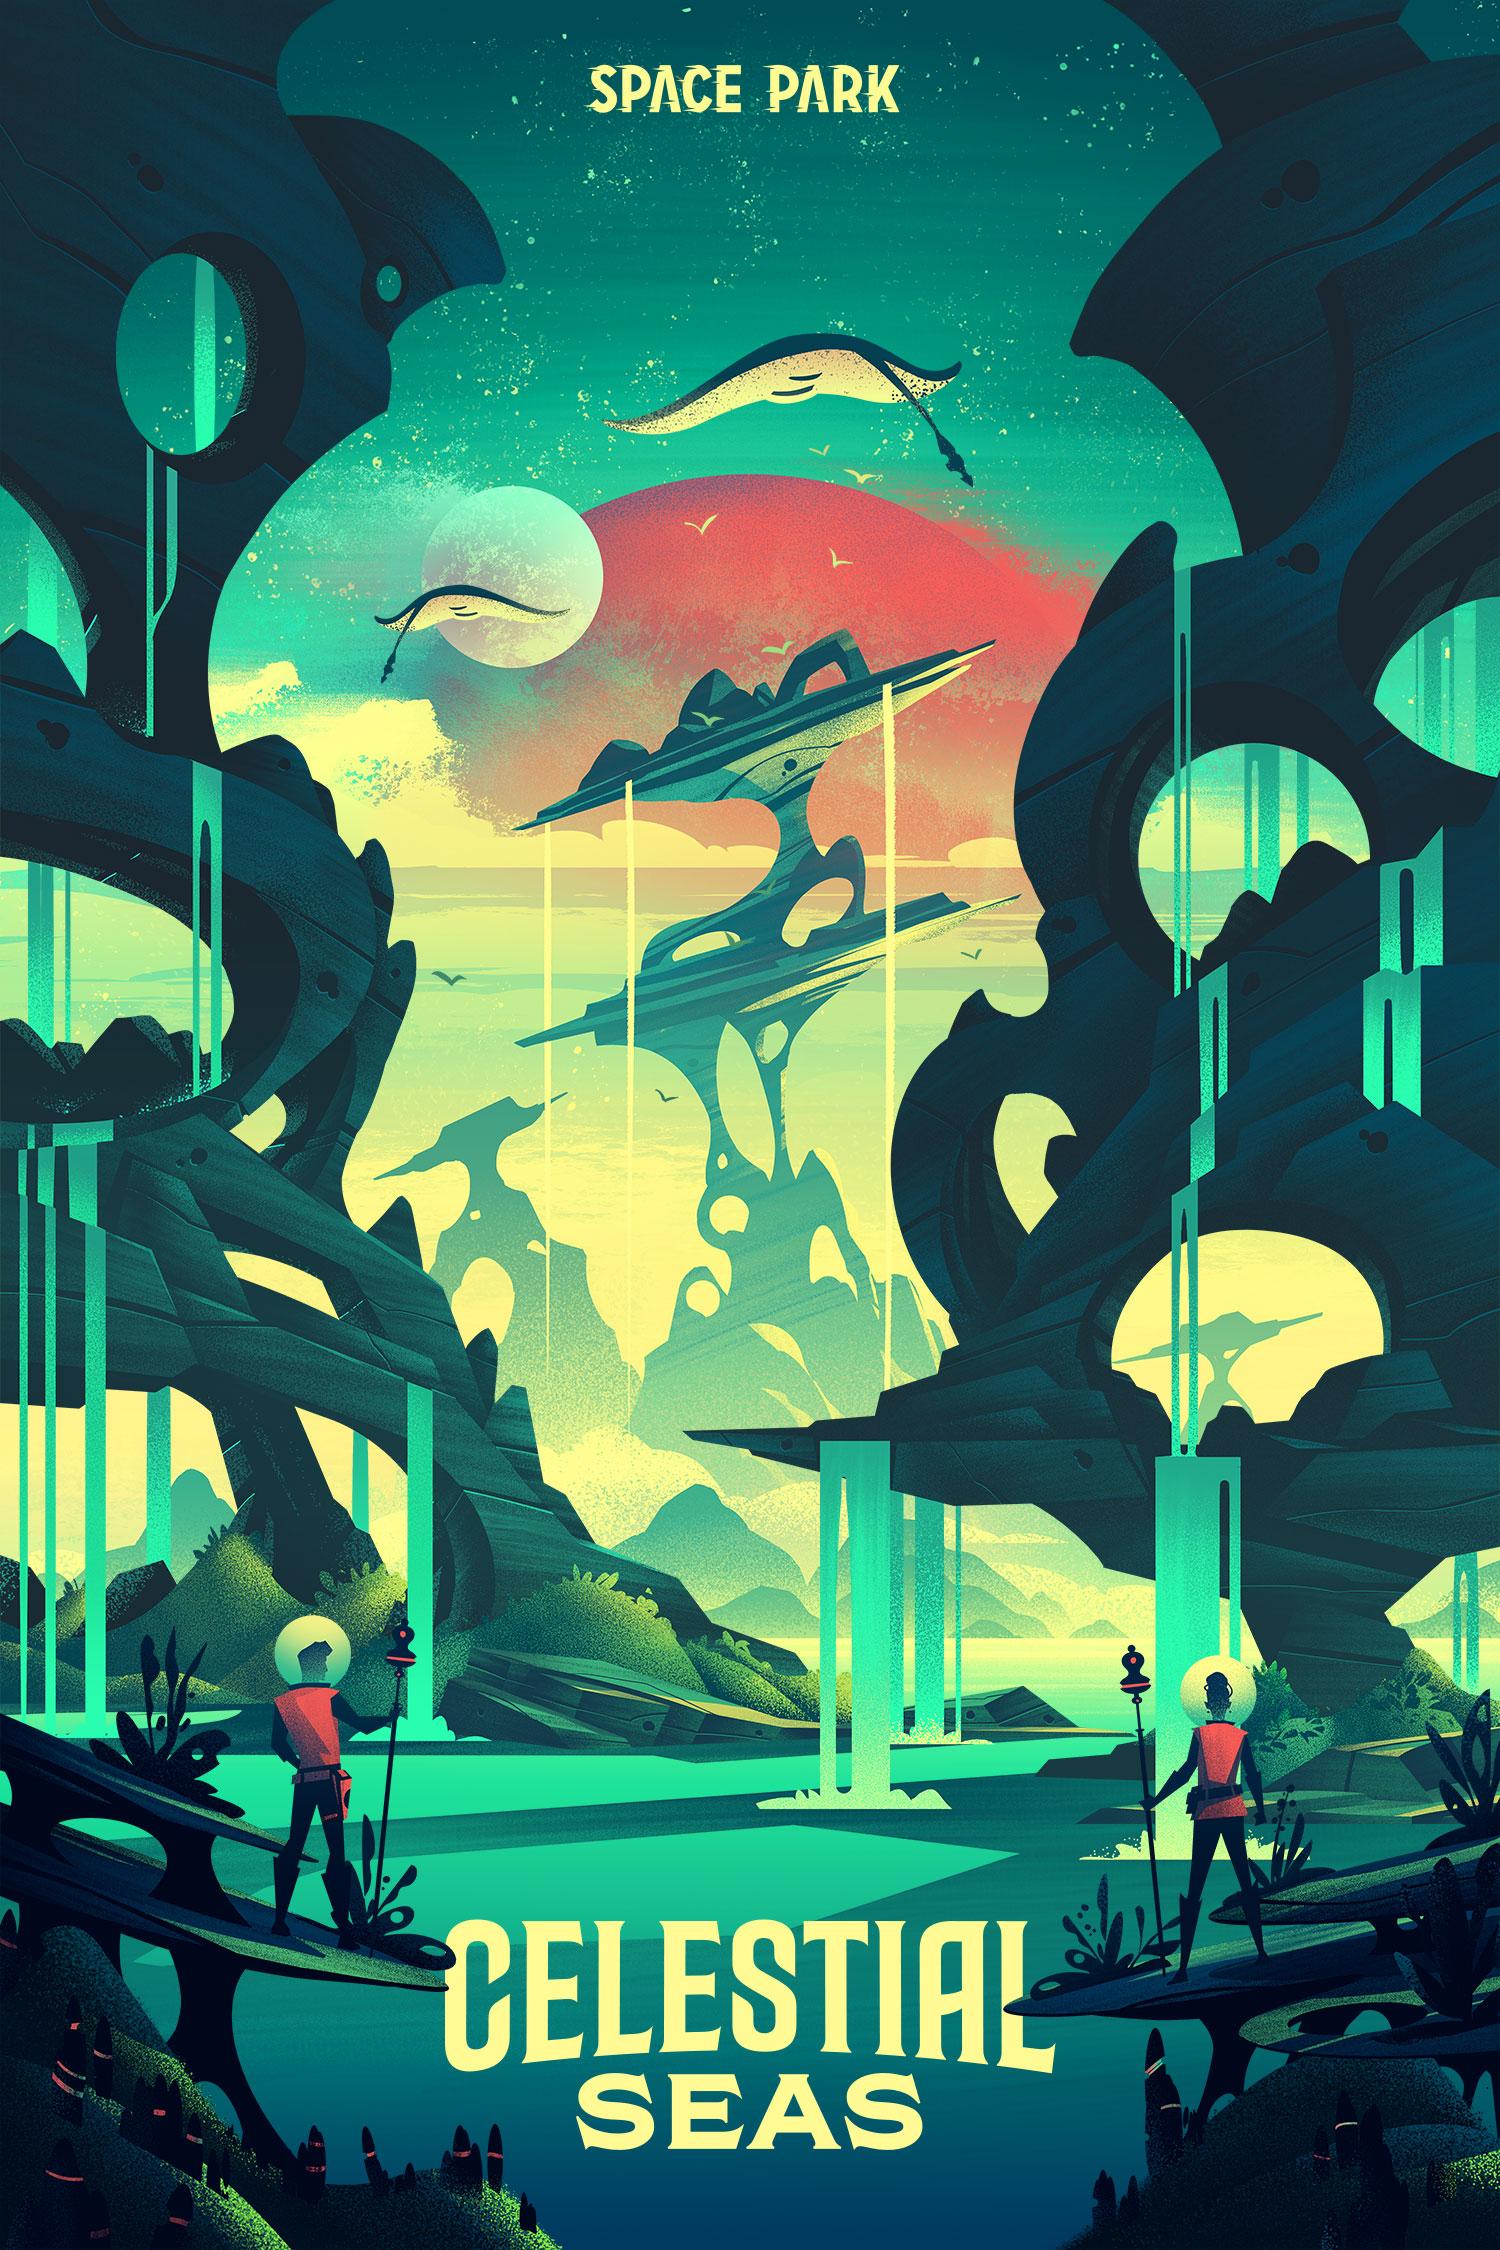 Space Park  · Celestial Seas · Type by Mattox Shuler